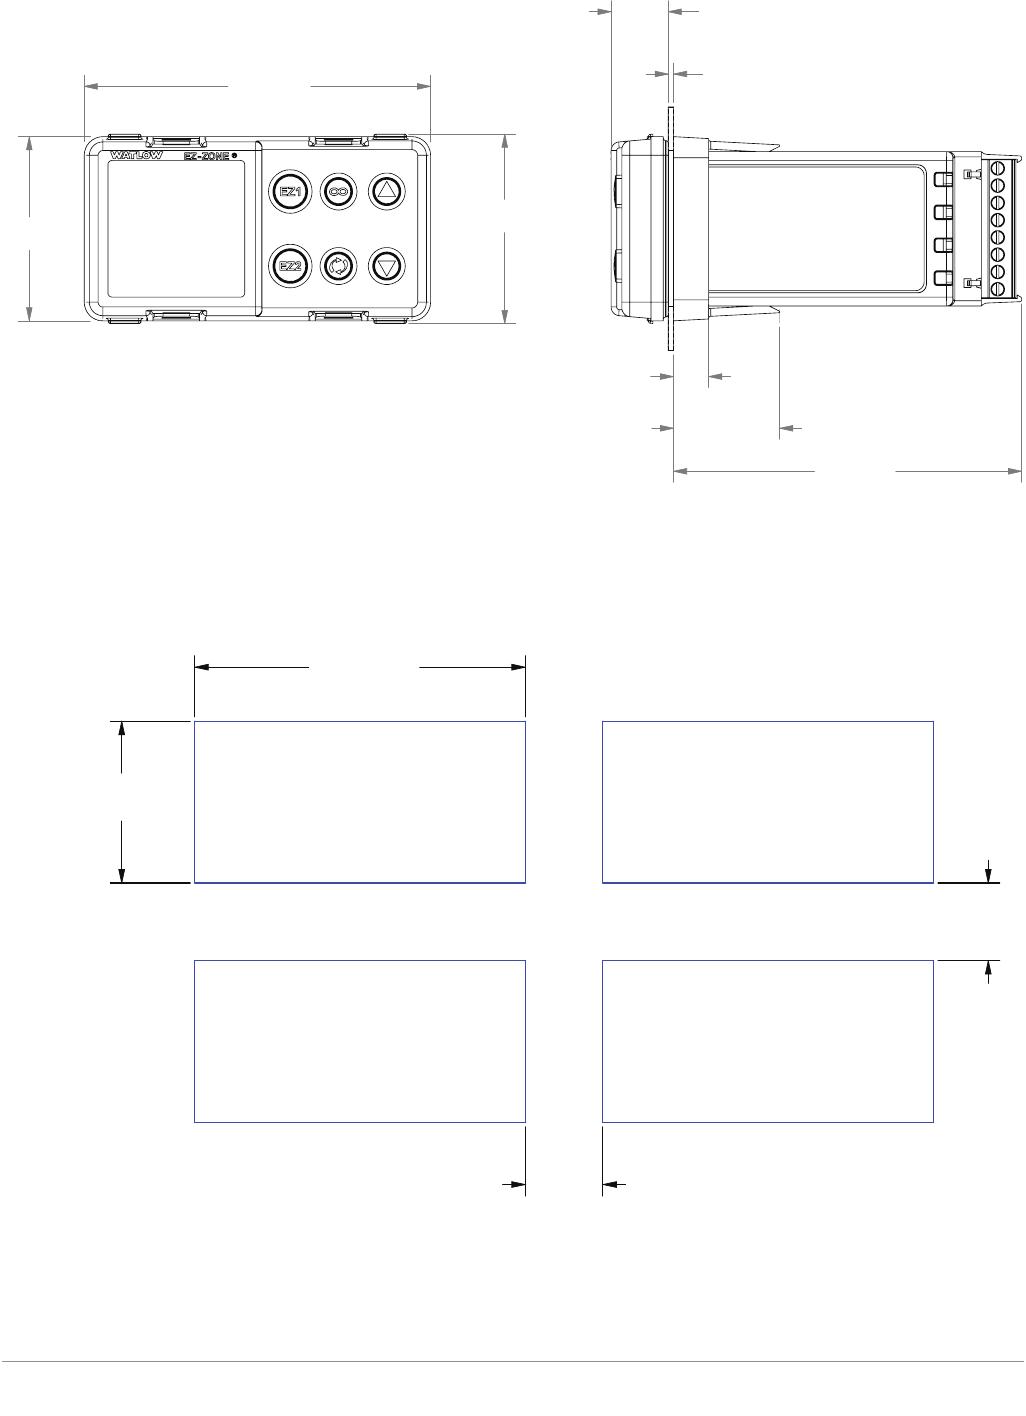 Watlow Ez Zone Wiring Diagram Download